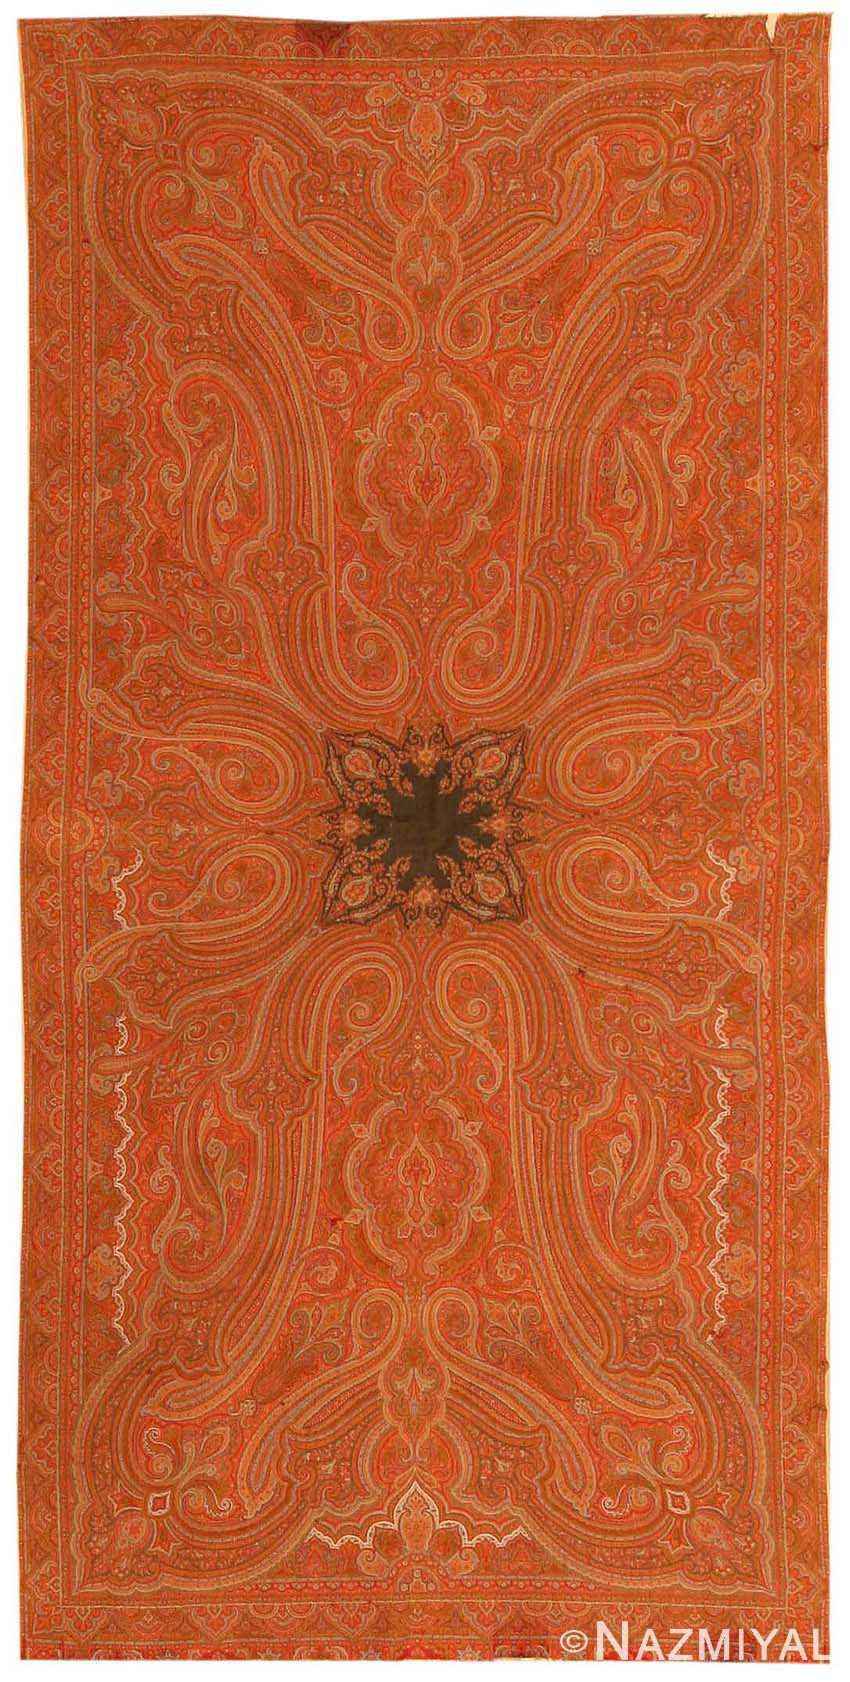 Antique Shawl 43794 Detail/Large View